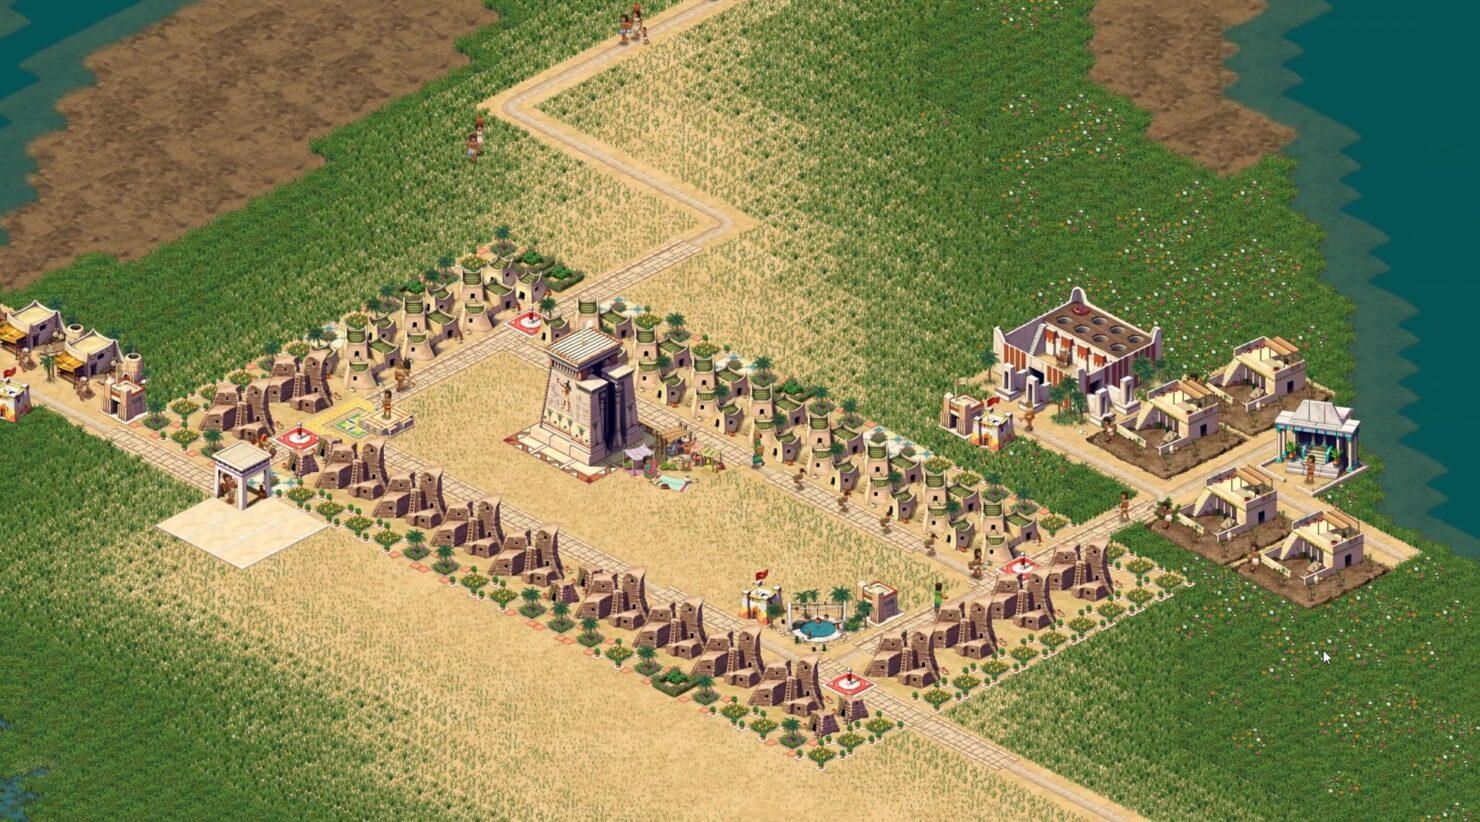 pharaoh-a-new-era-preview-02-screenshot-1